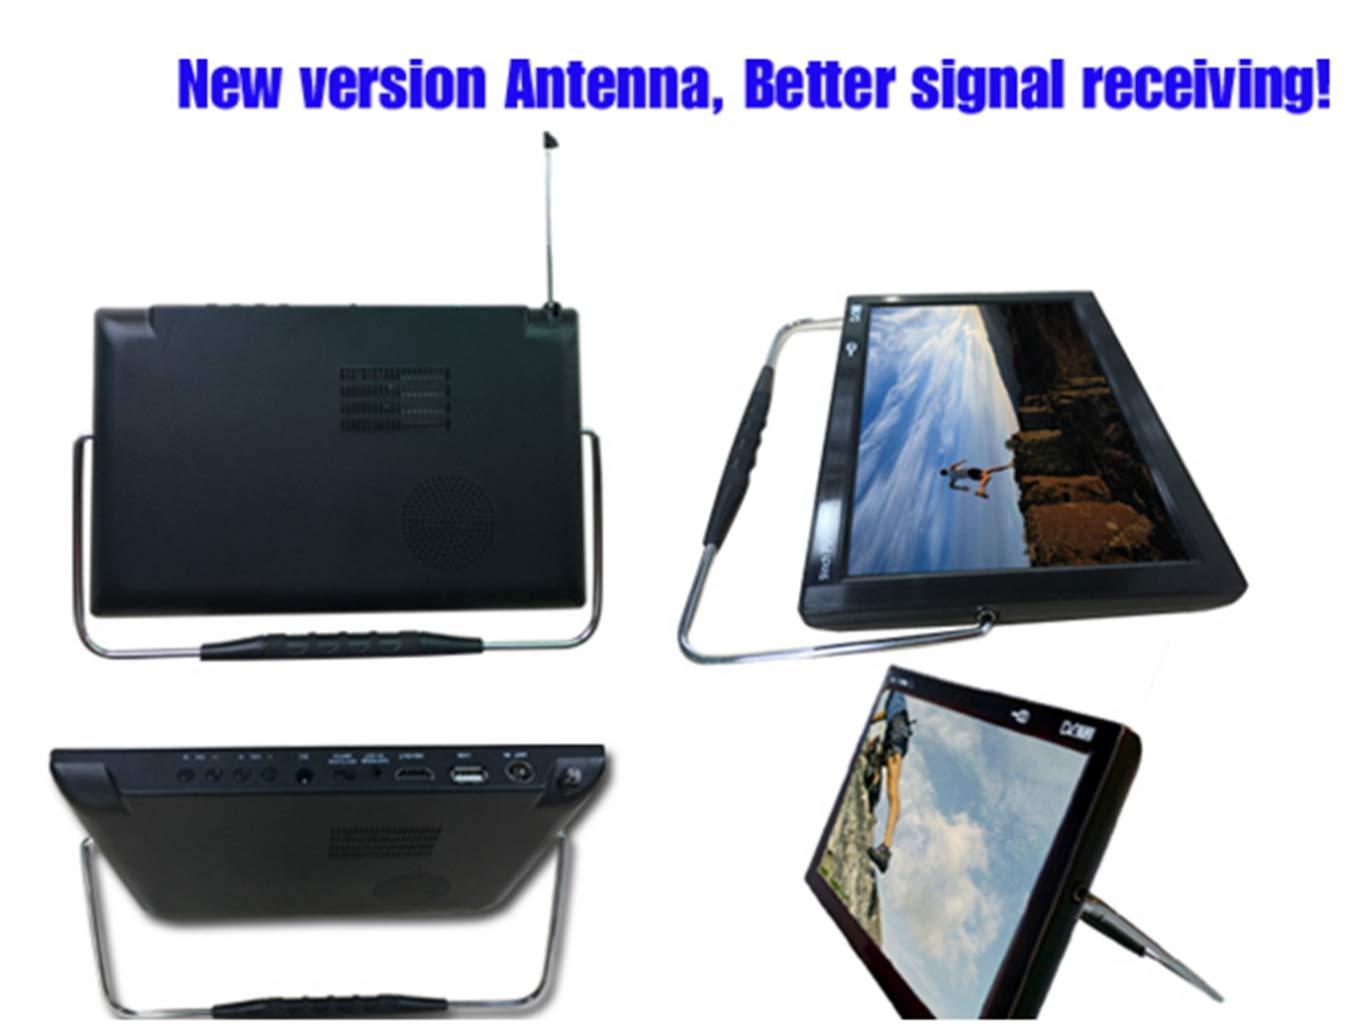 Amazon.com: SYSINN Mini TV de 9 pulgadas con SD y diseño ...